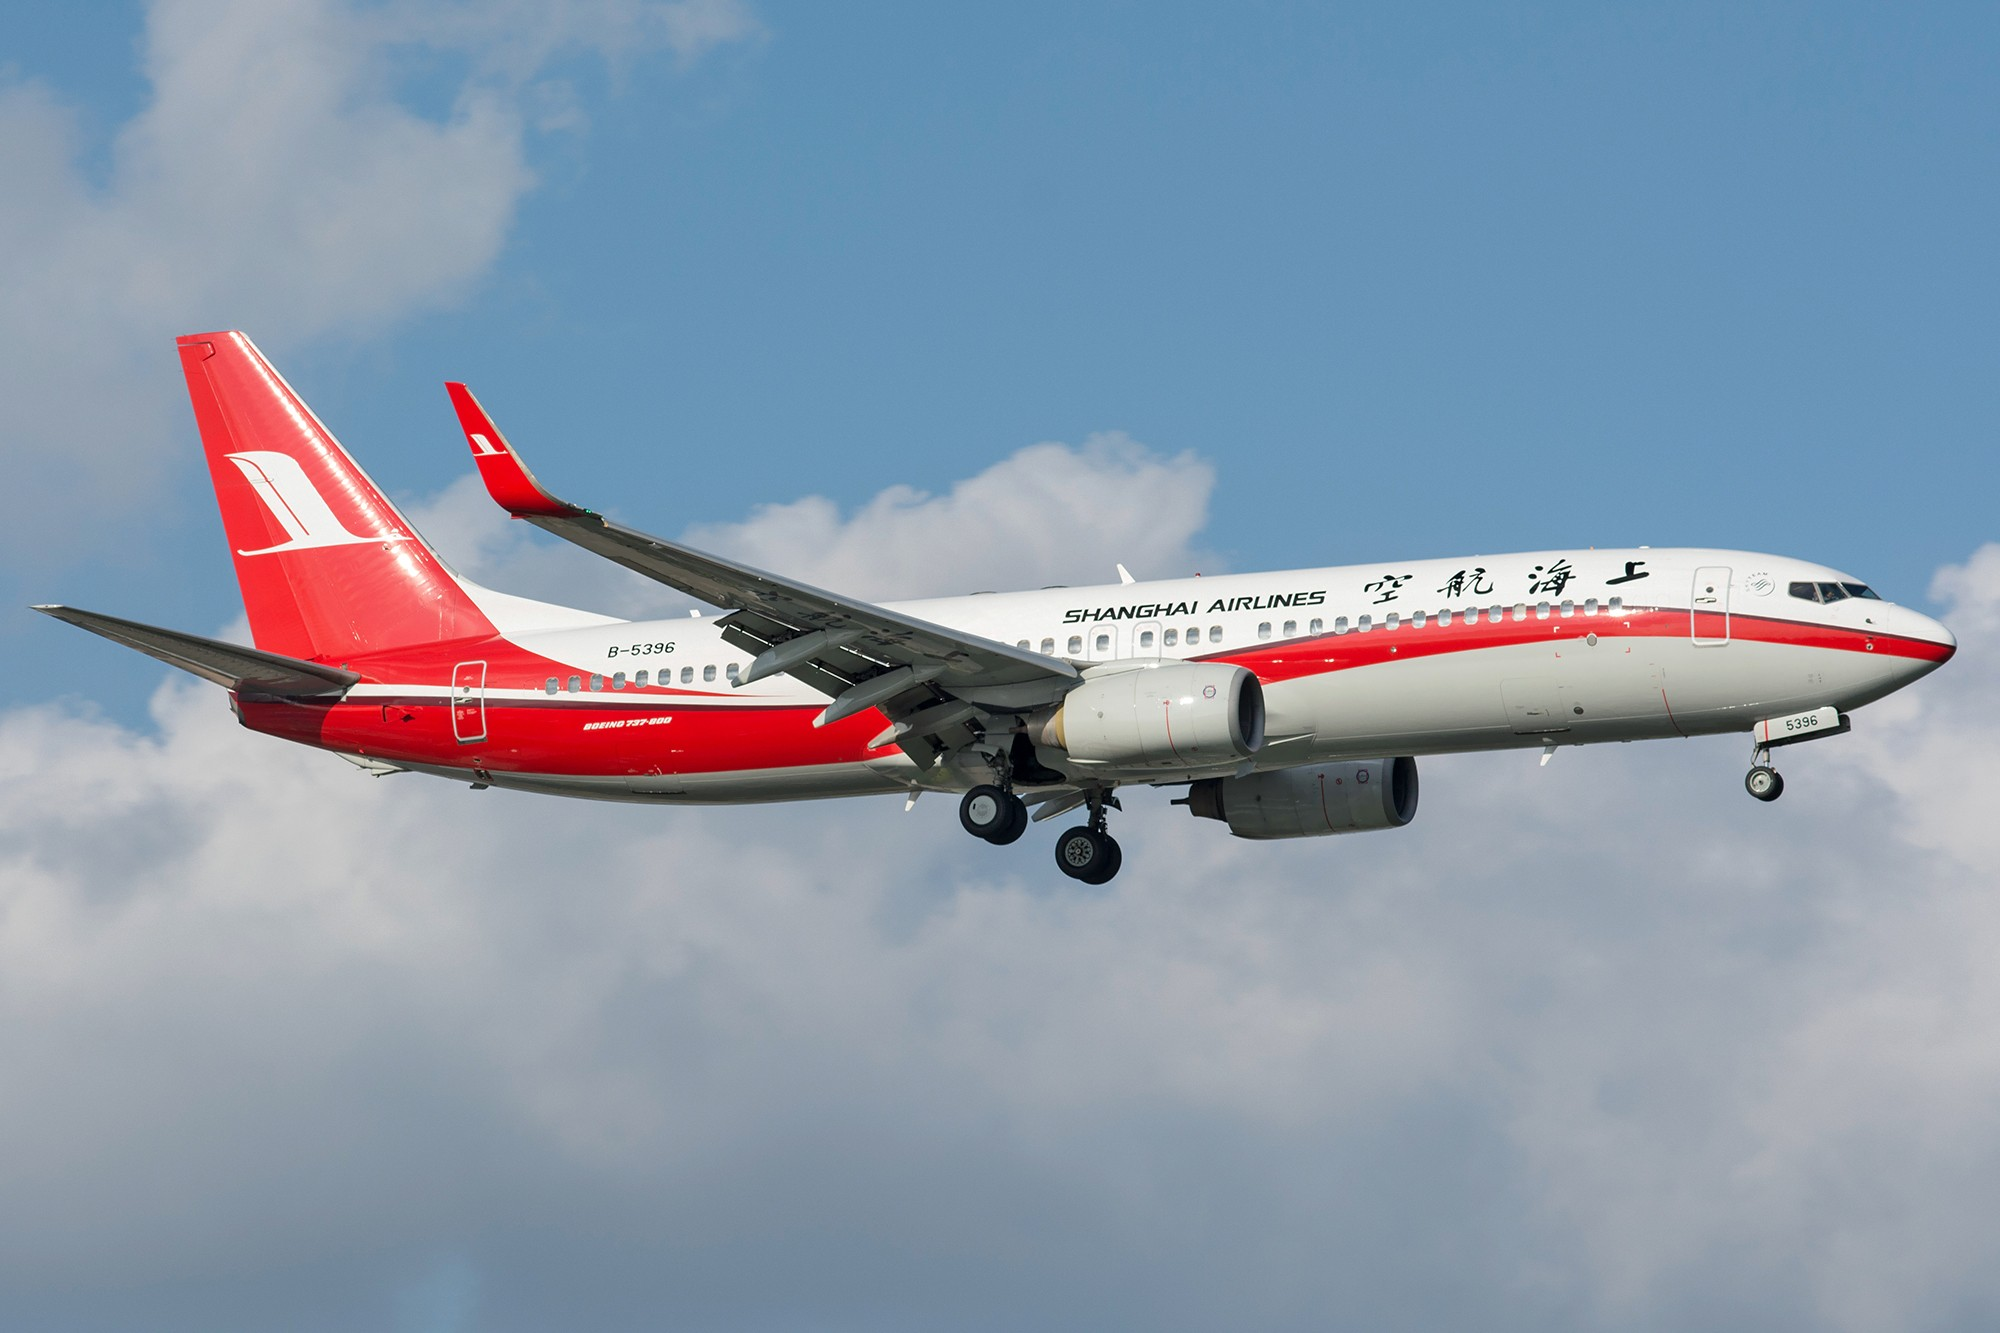 Re:[原创][SHA]蓝天白云下737一组 BOEING 737-800 B-5396 中国上海虹桥国际机场